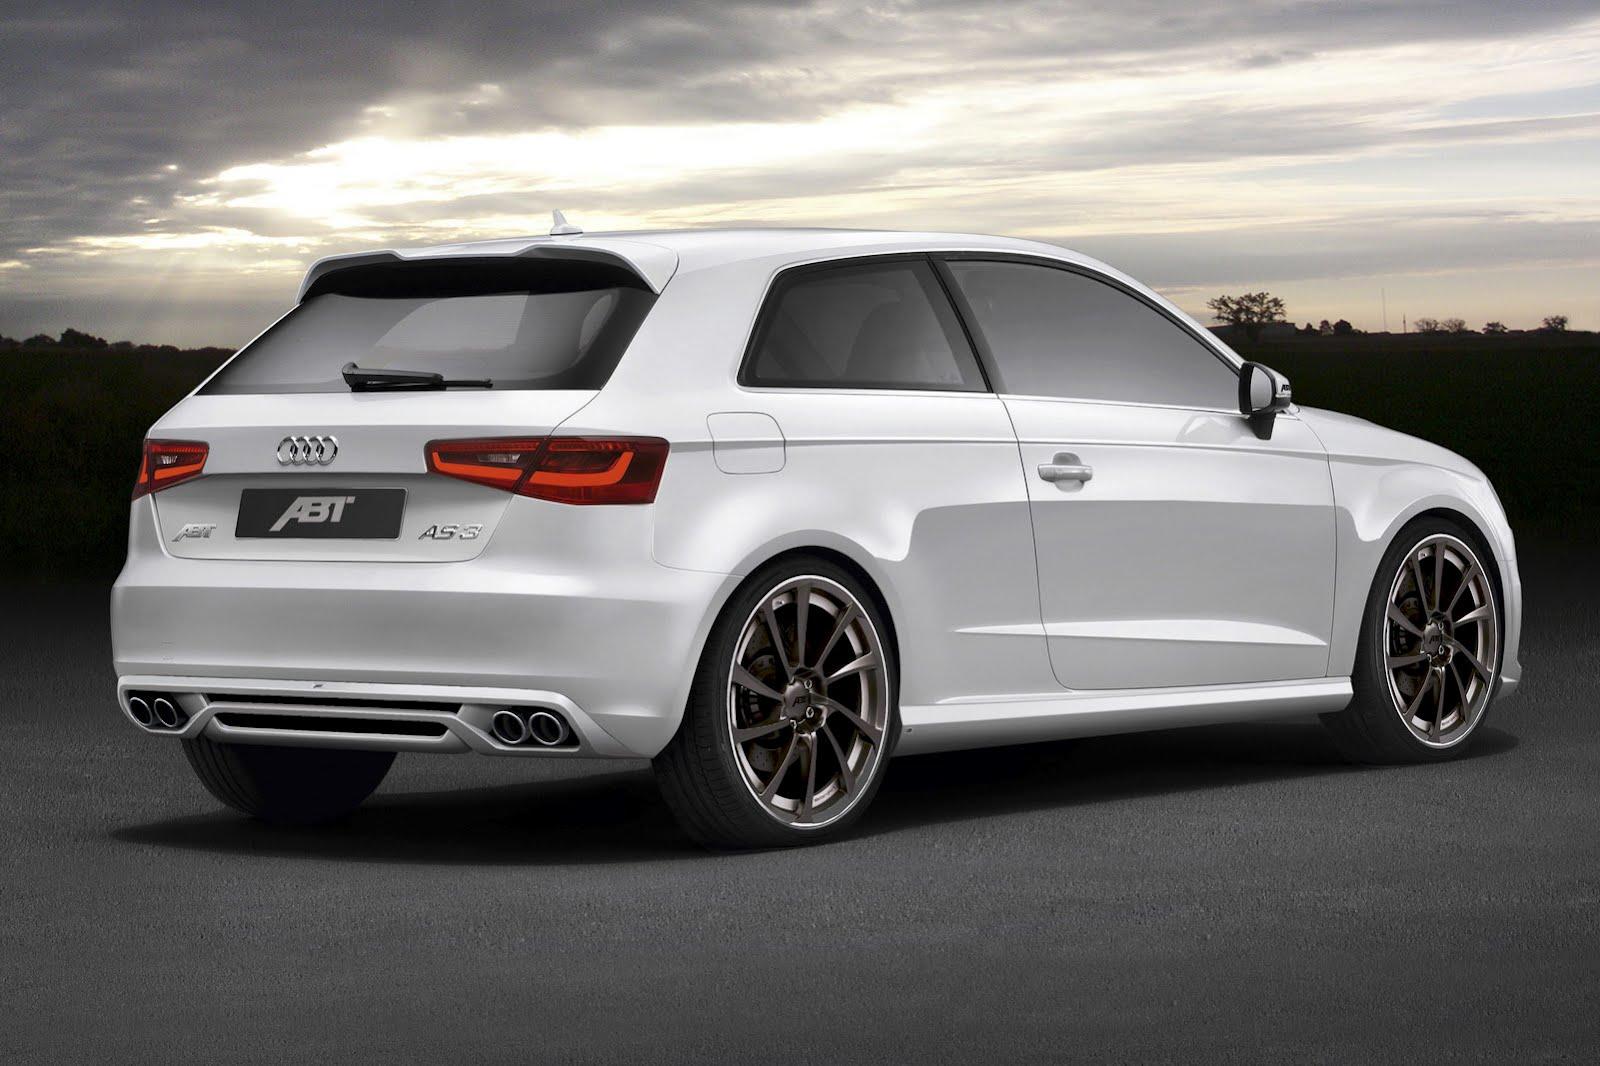 Audi A3 by ABT Sportsline